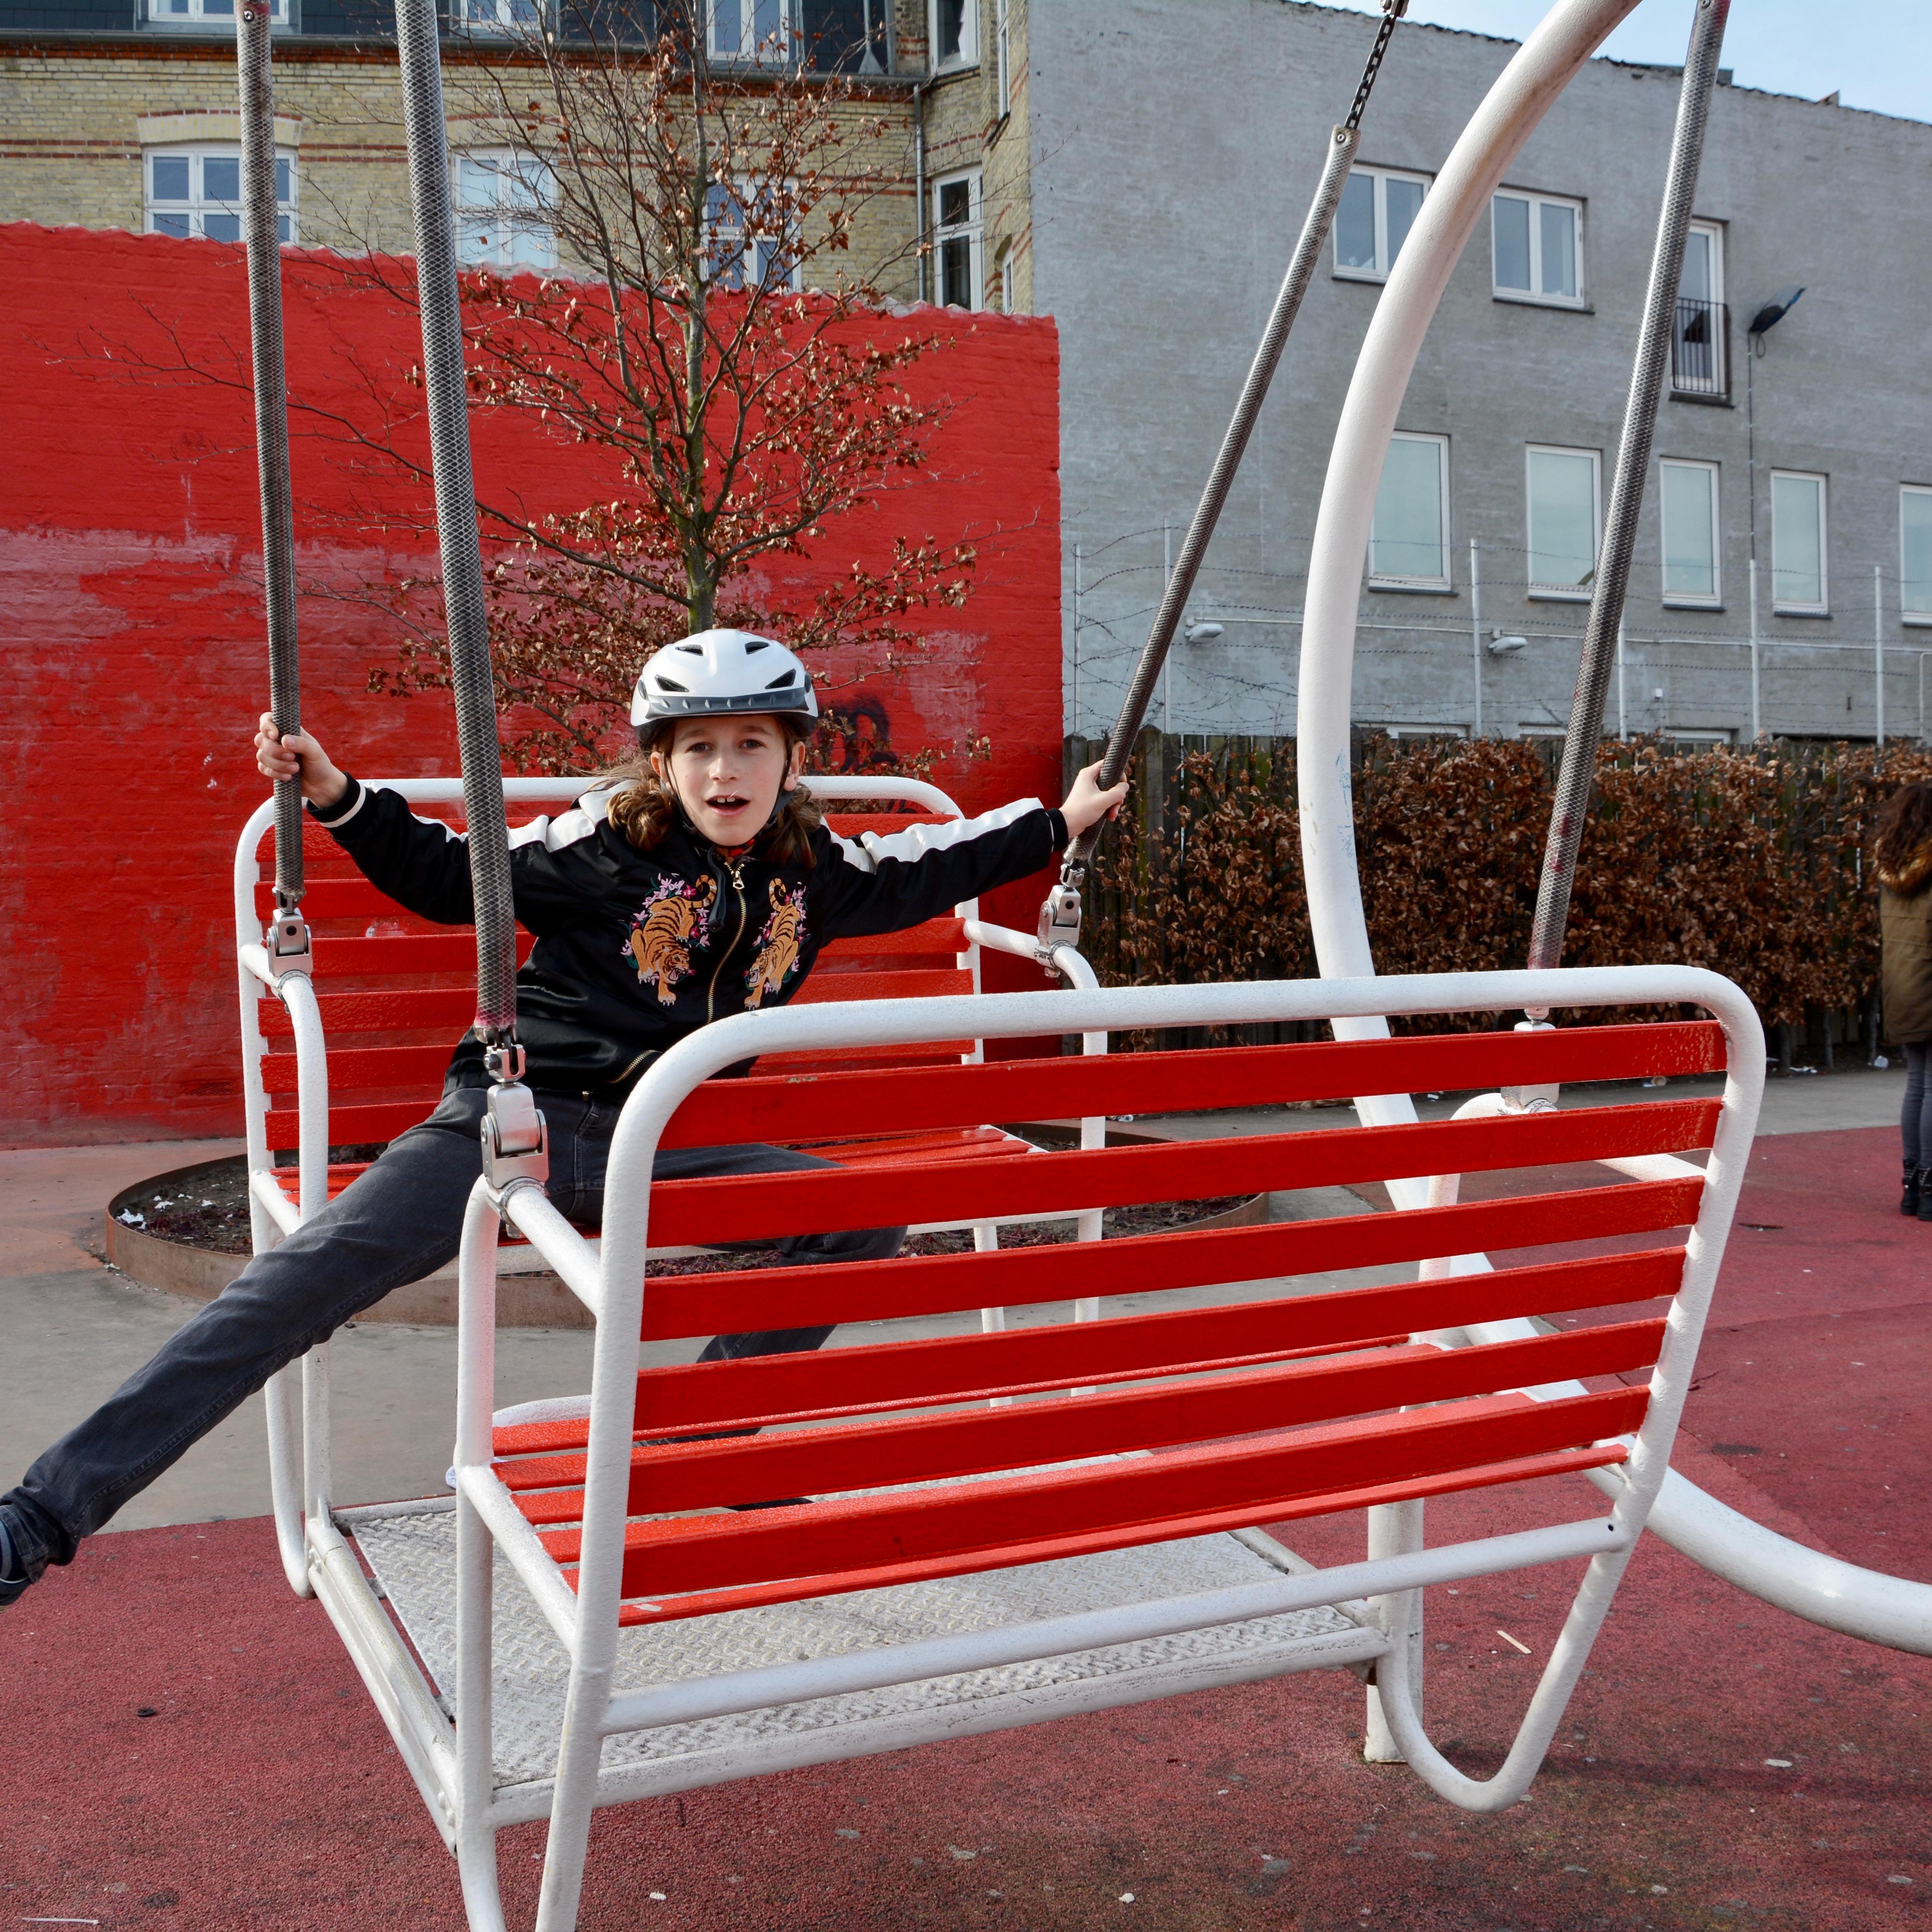 travel with kids children Copenhagen Denmark norrebro superkilen park swing